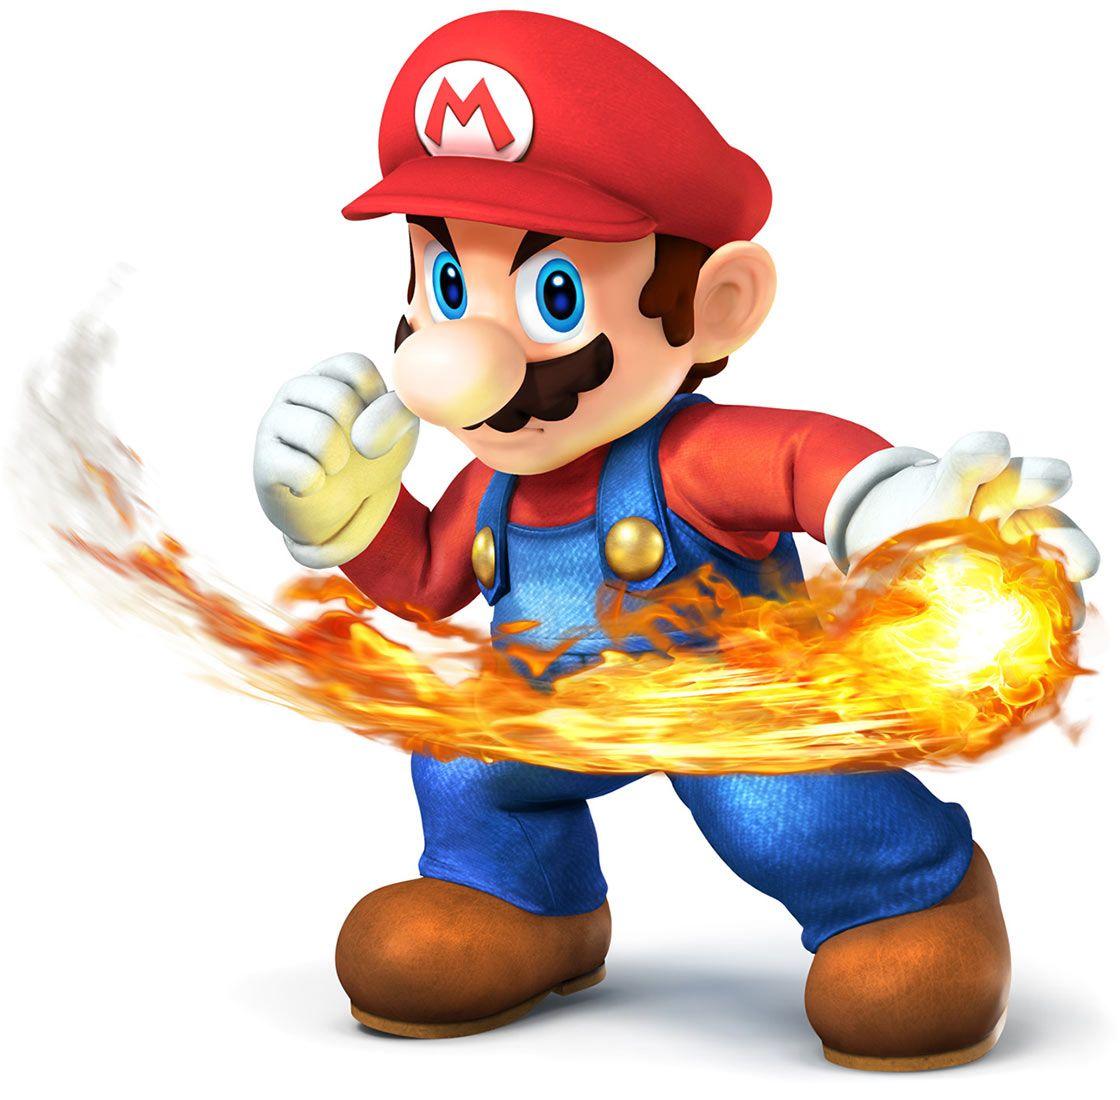 Pin By Luminetik On 3d Art Smash Bros Wii Super Mario Bros Mario Bros